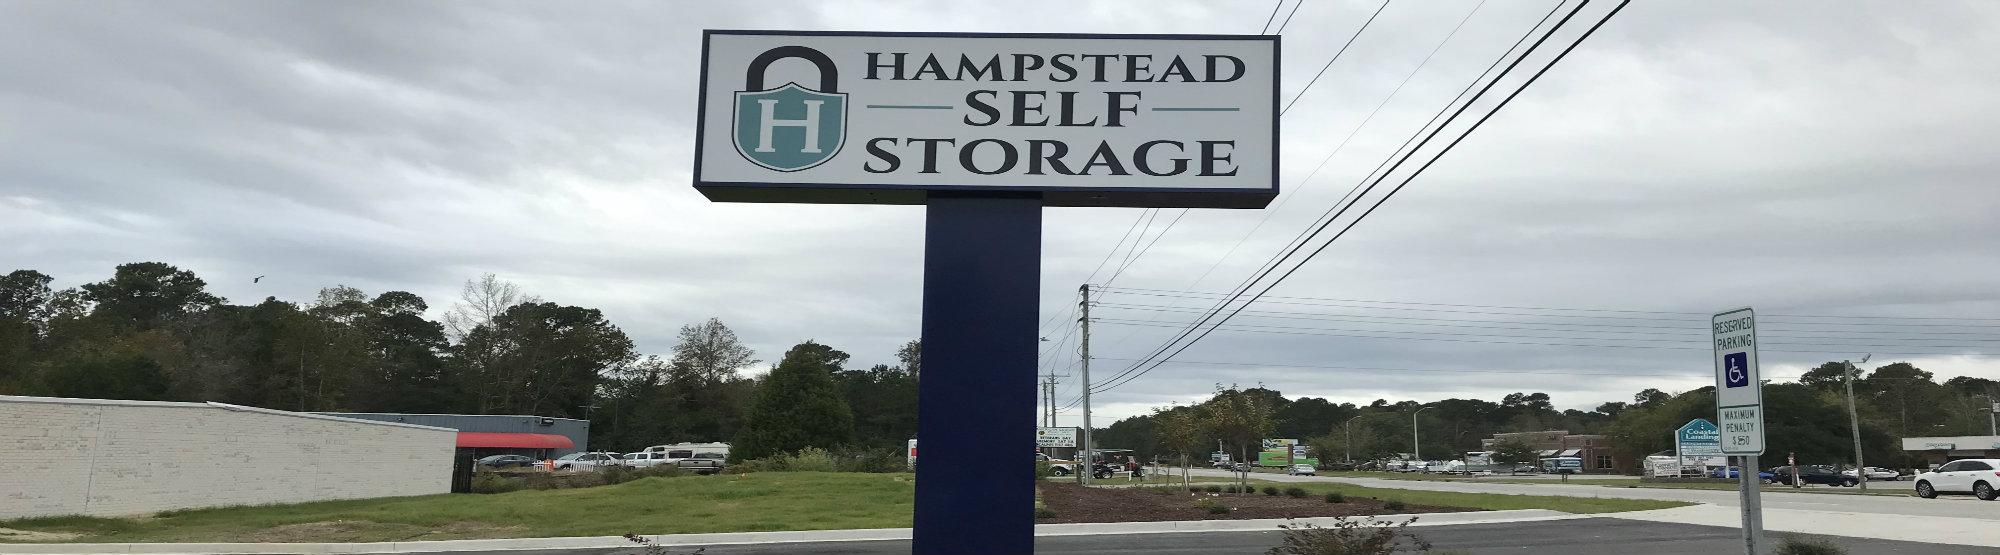 H&stead NC Storage Units; H&stead Self Storage; H&stead Self Storage; Interior Climate Controlled ... & Hampstead NC Storage Units | Hampstead Self Storage LLC